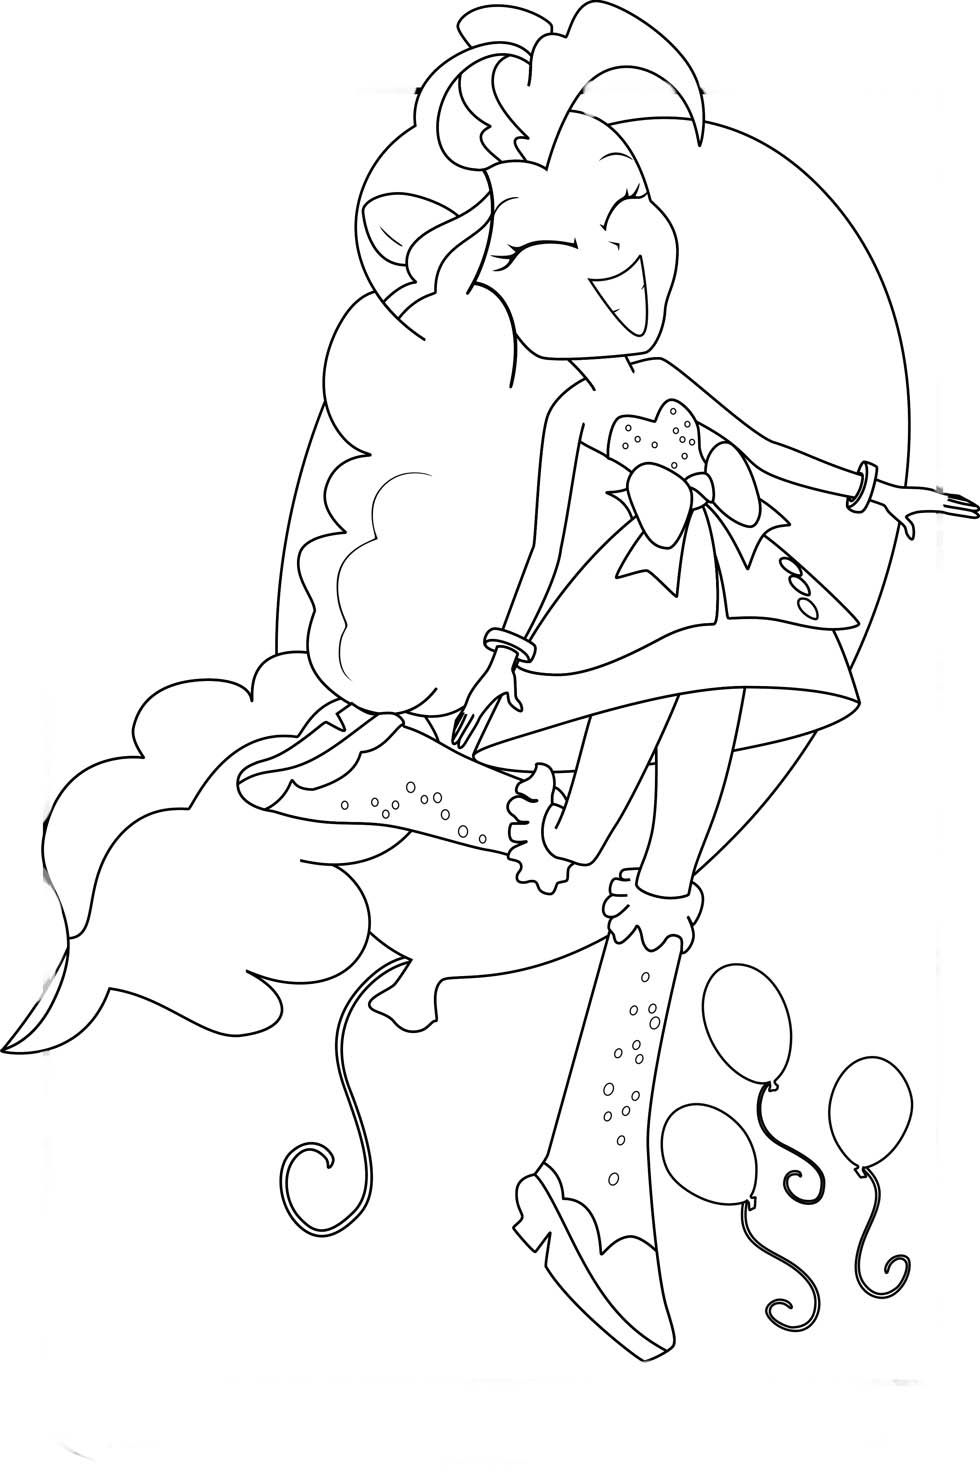 Equestria Girls Para Colorir Paginas Para Colorir Desenhos